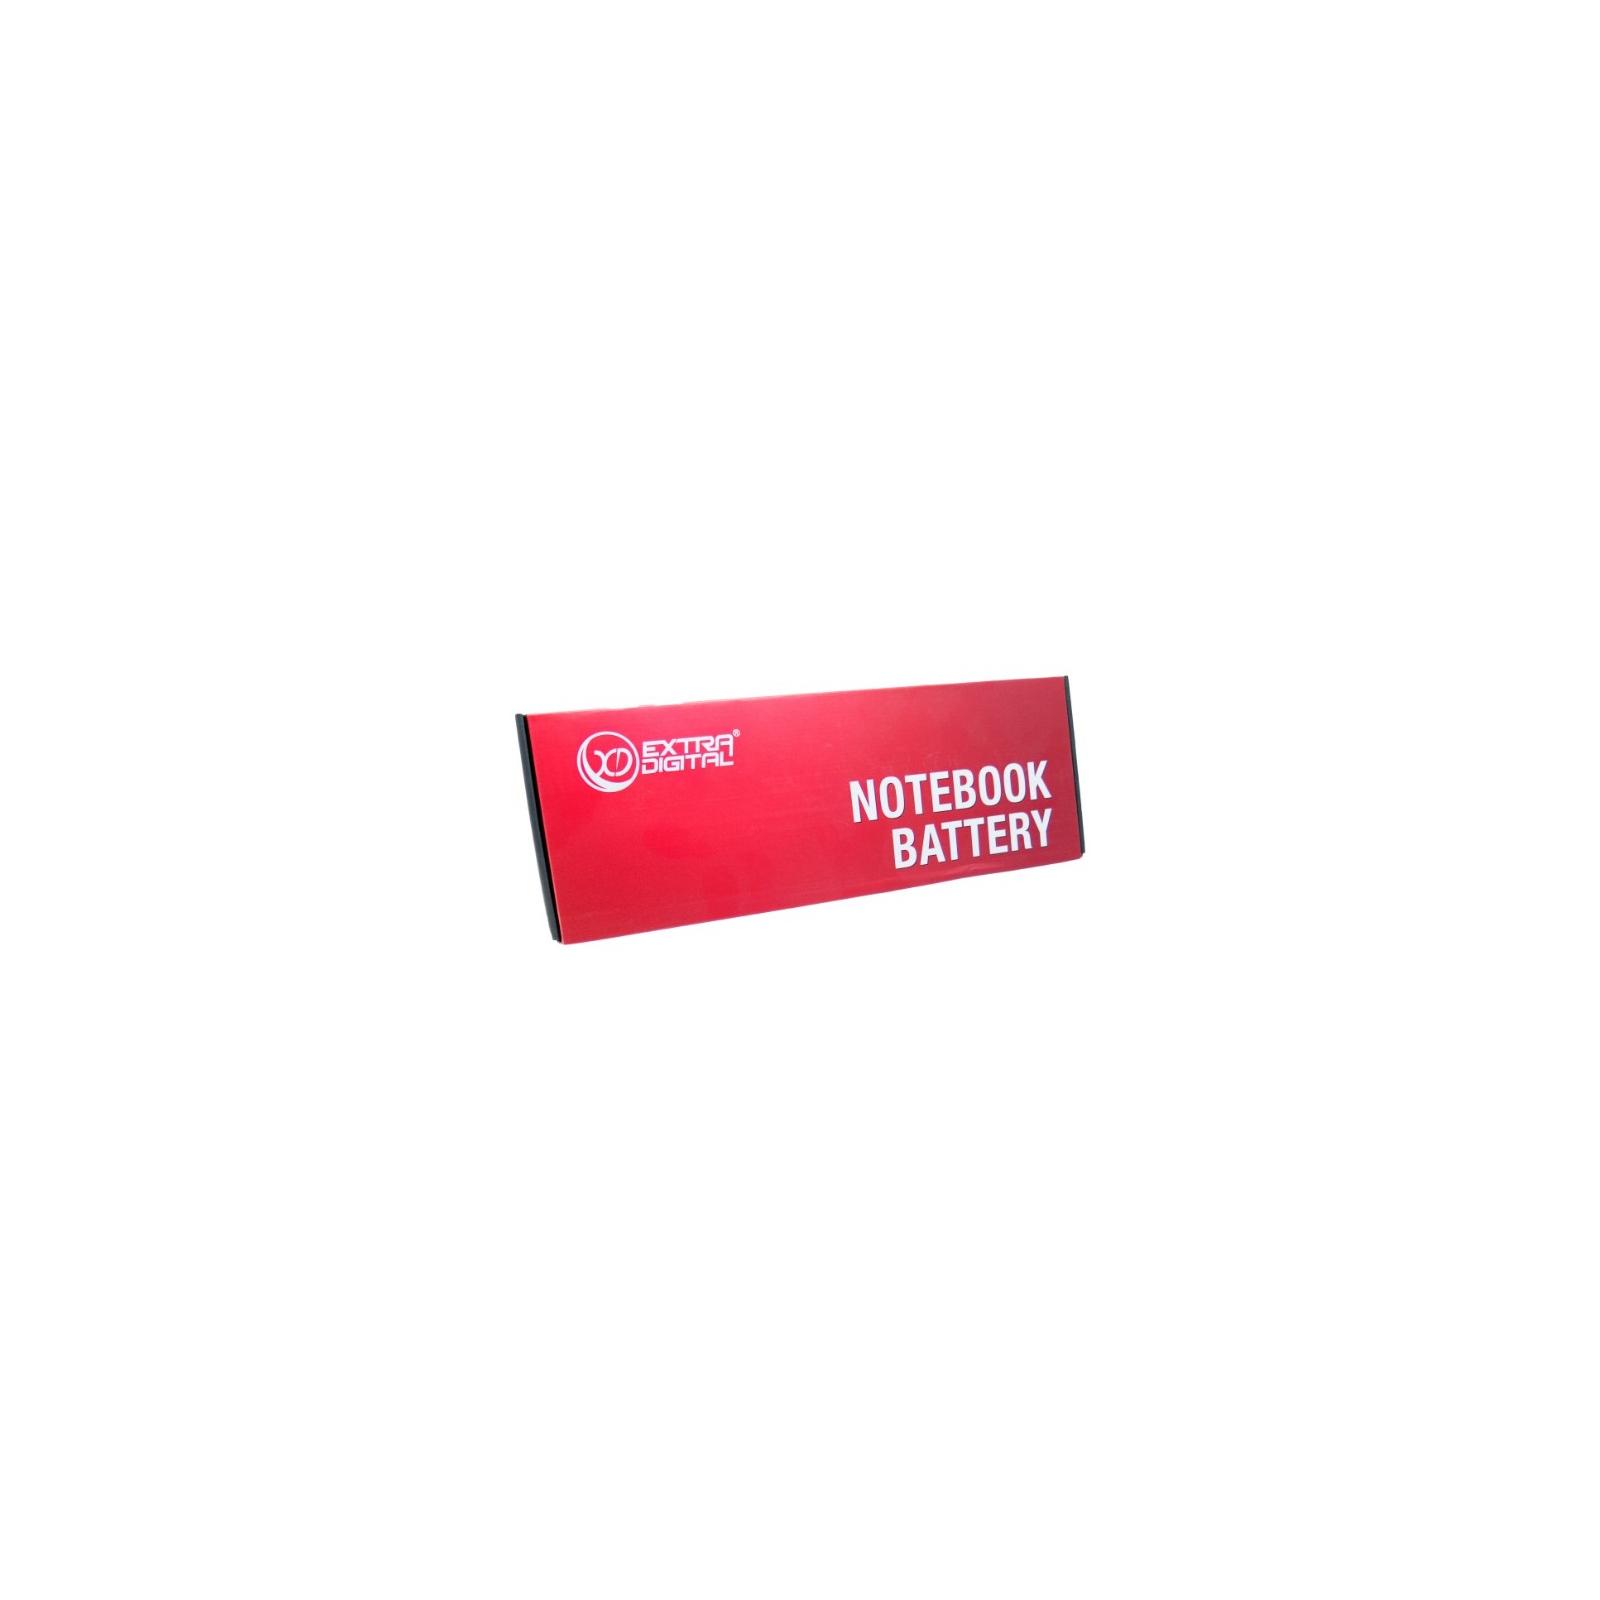 Аккумулятор для ноутбука Asus A32-X401 10.8 V, 5200 mAh 56 Wh Extradigital (BNA3998) изображение 4